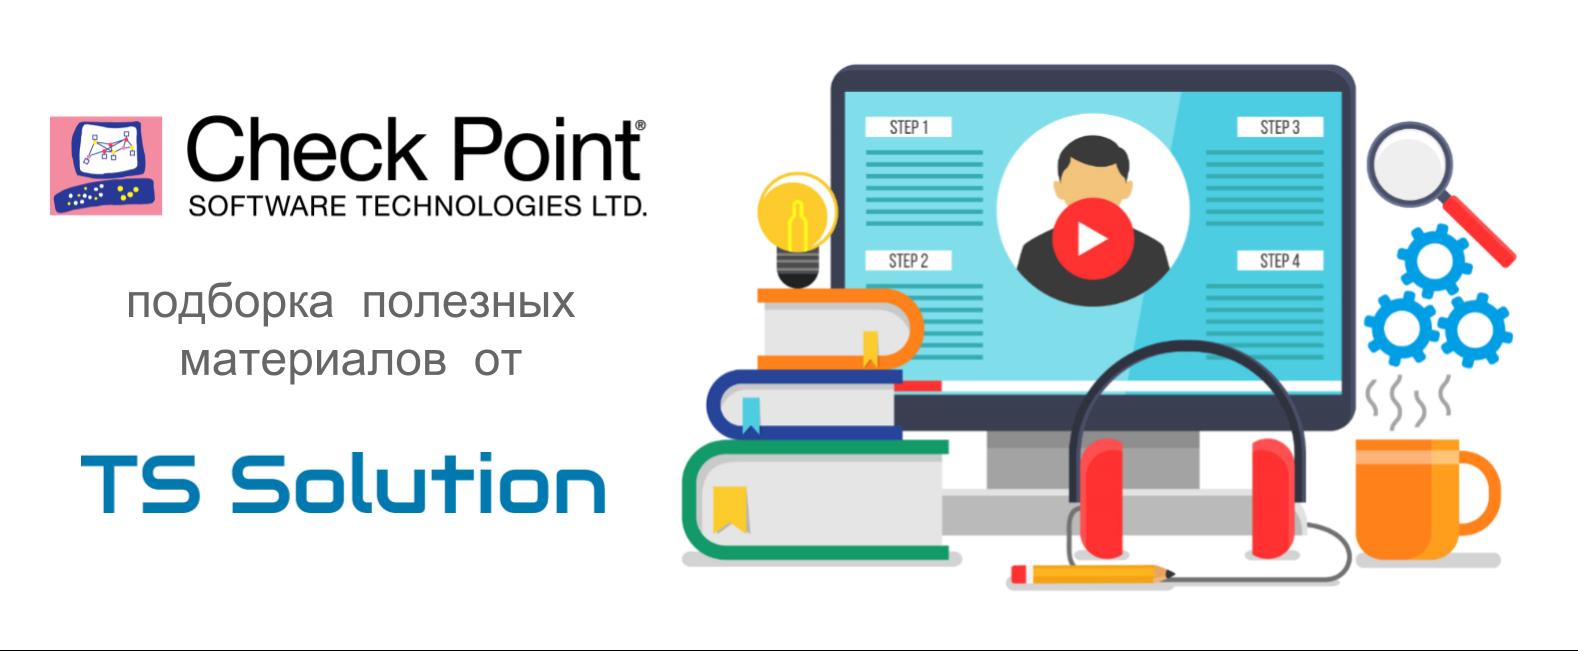 Check Point. Подборка полезных материалов от TS Solution - 1